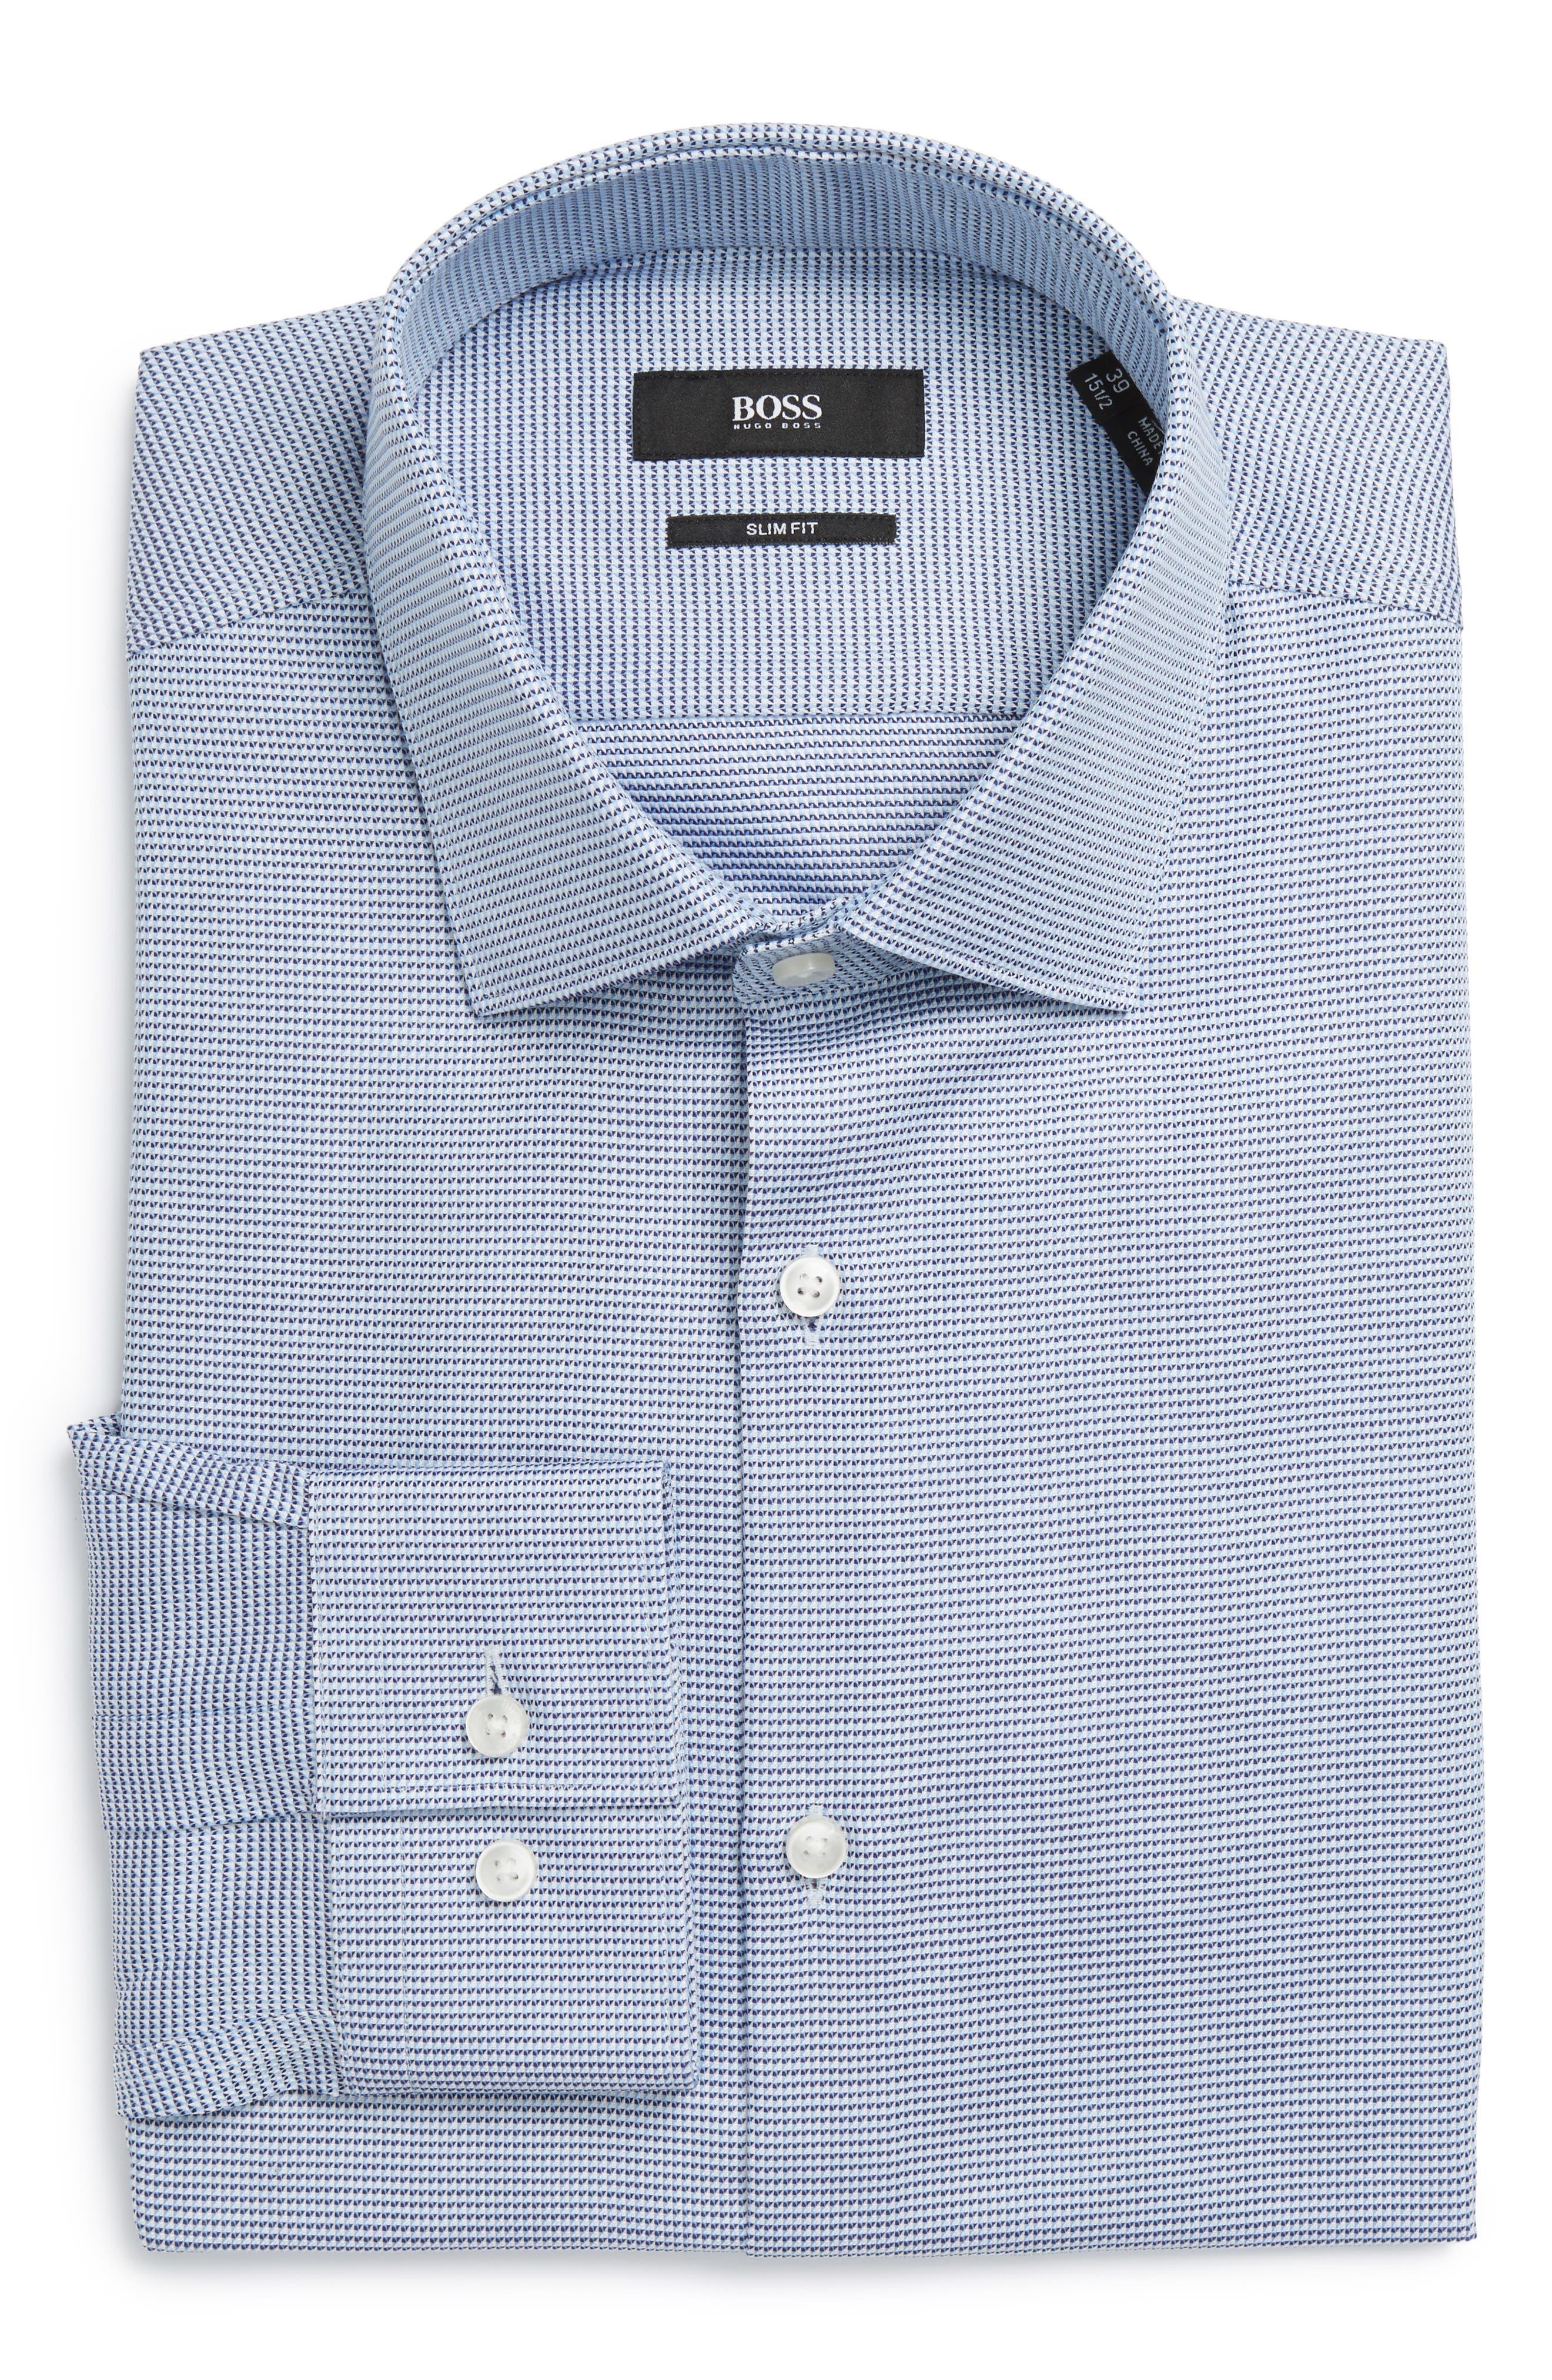 BOSS Ismo Slim Fit Geometric Dress Shirt